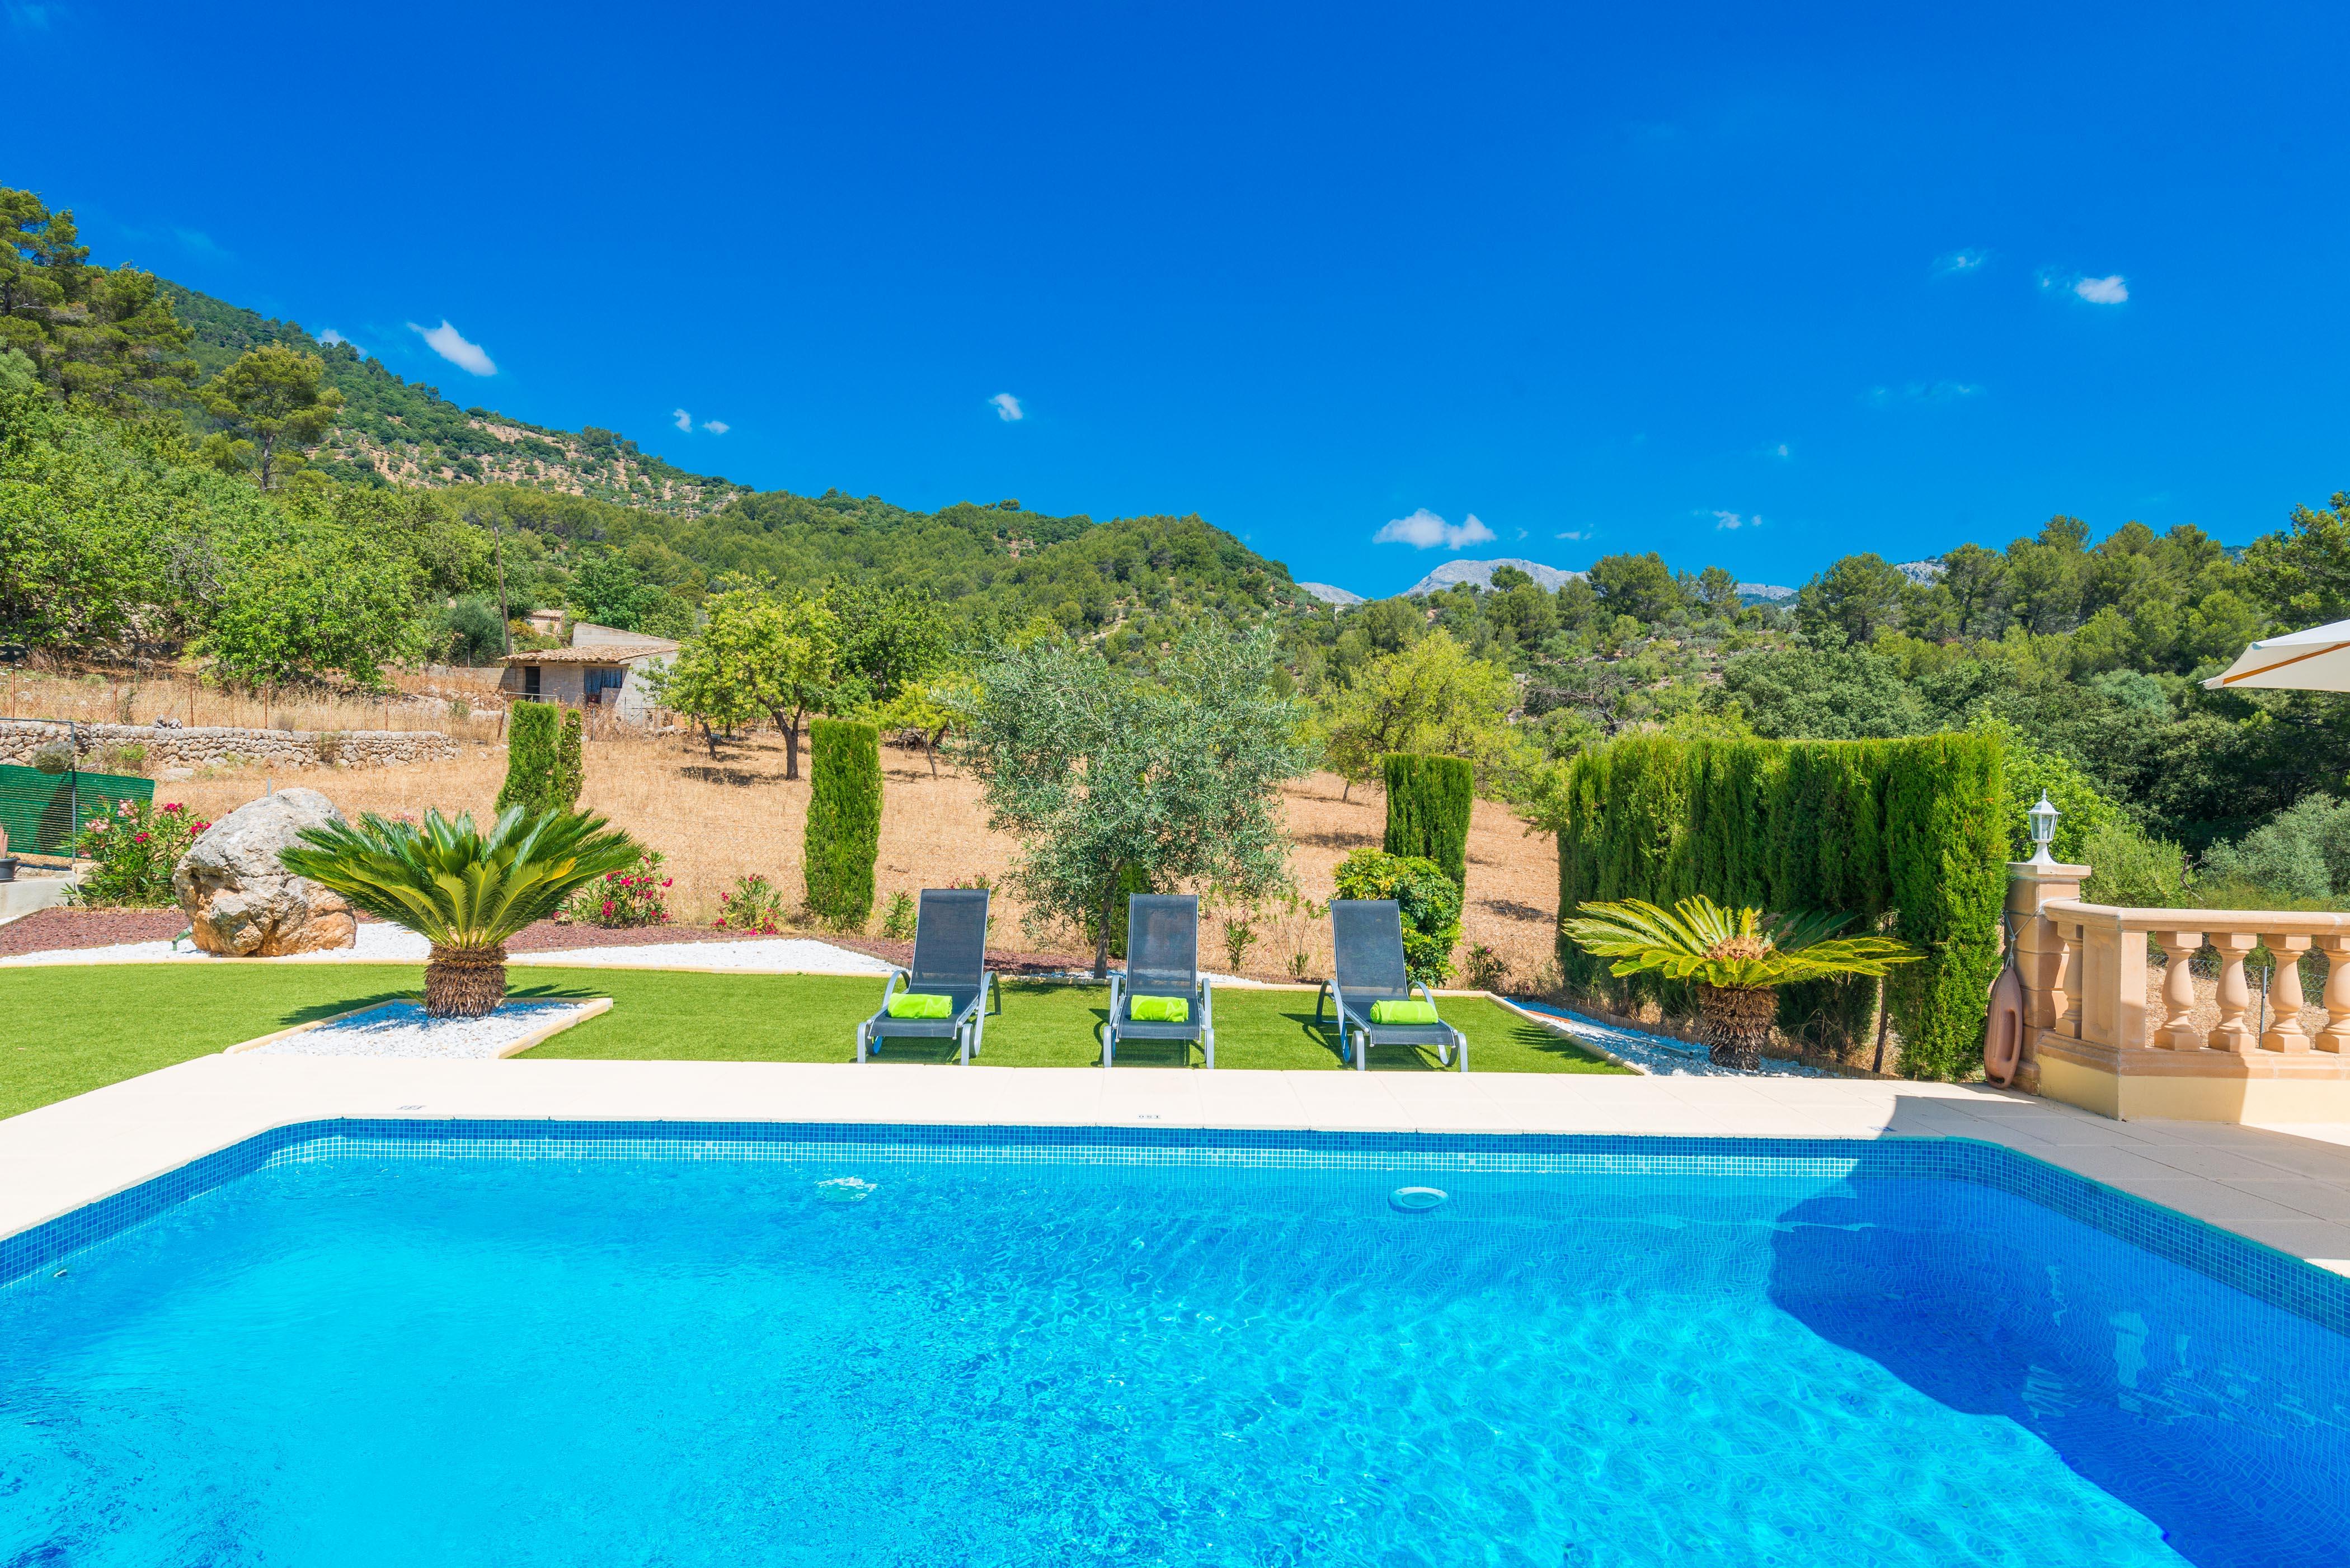 Ferienhaus SA TANCA (MANCORINA) (2037553), Mancor de la Vall, Mallorca, Balearische Inseln, Spanien, Bild 6